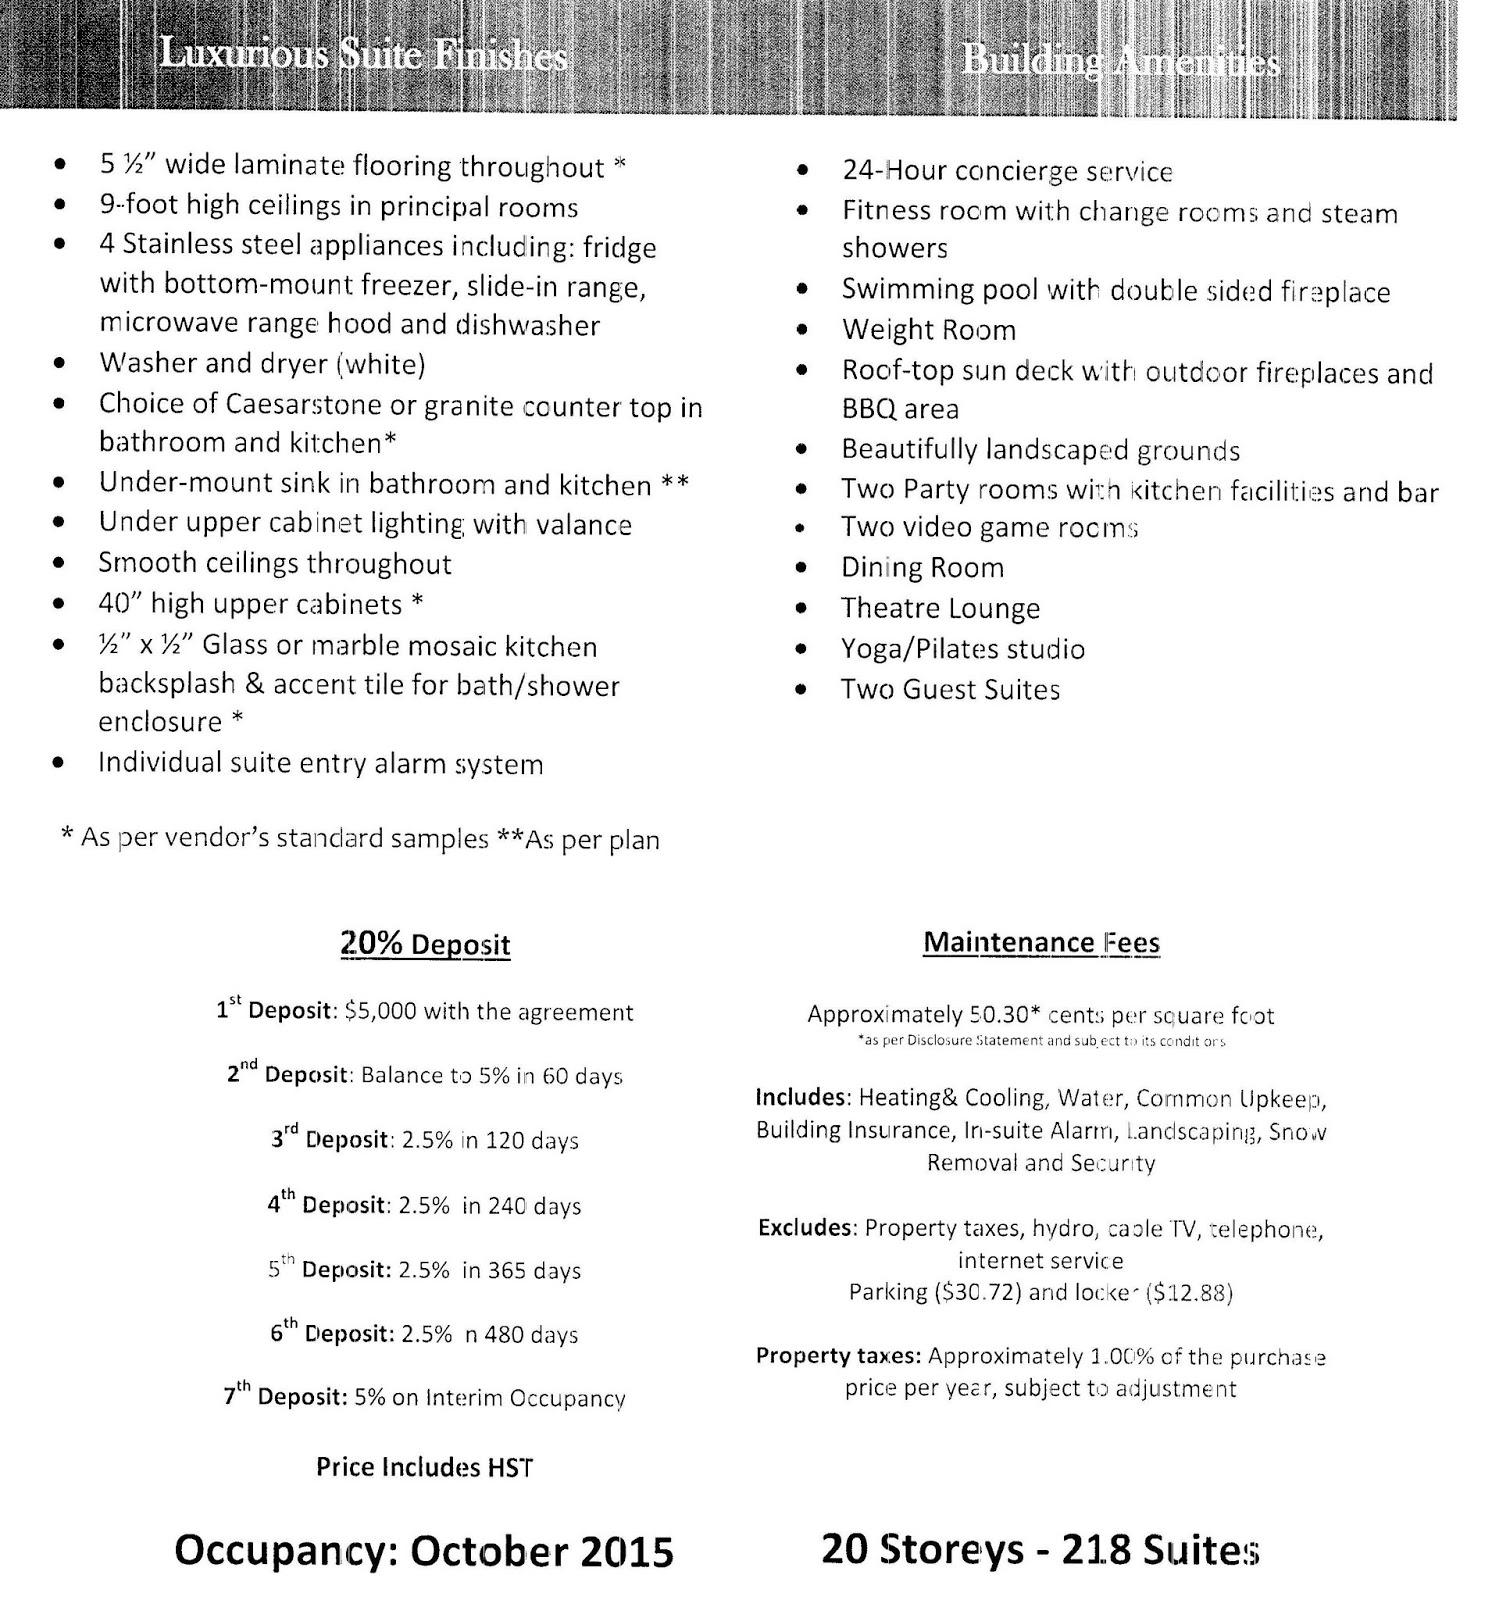 Greater Toronto Area Real Estate News Sky City Condo 2 Yonge Hwy 7